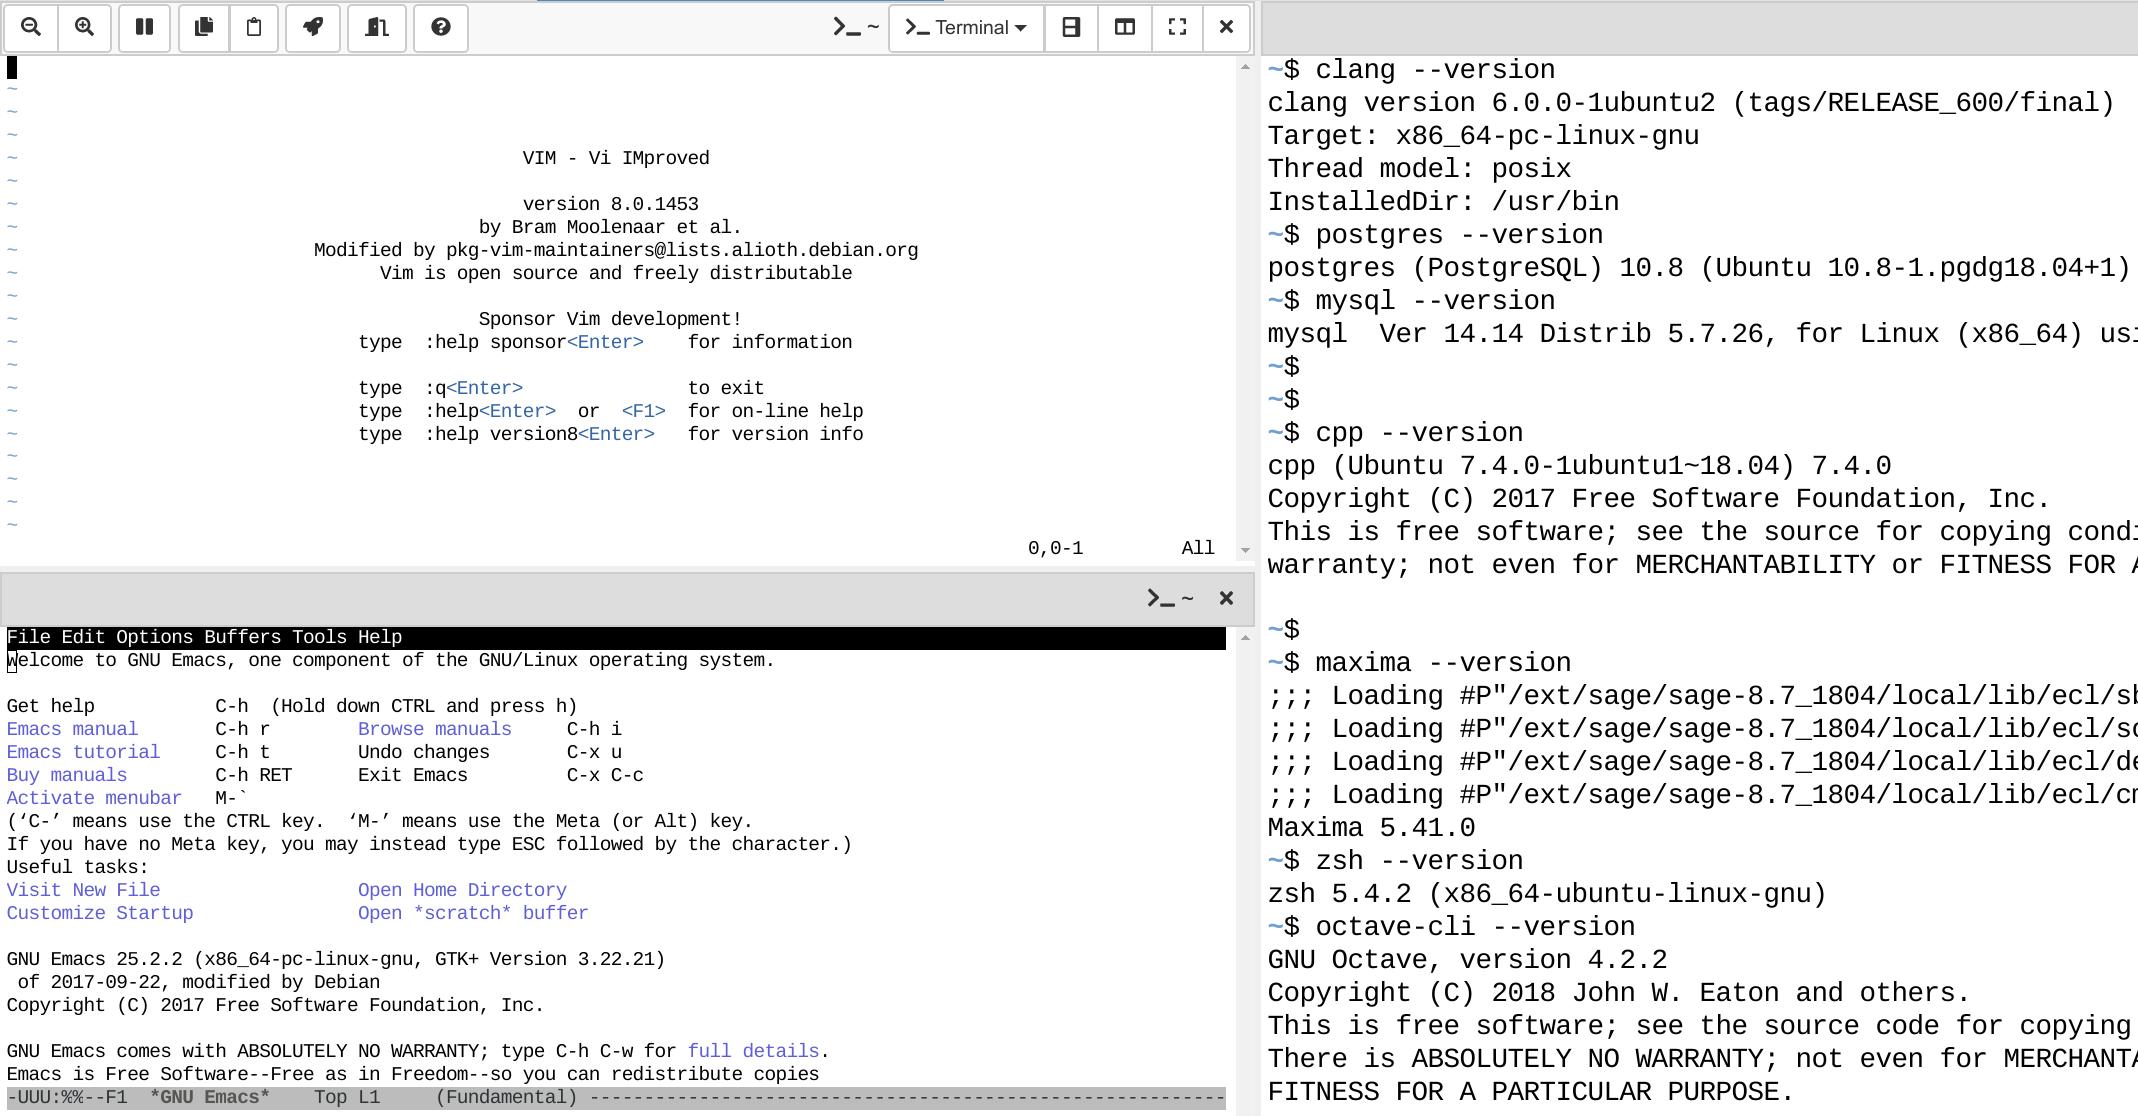 CoCalc - Online Linux Environment